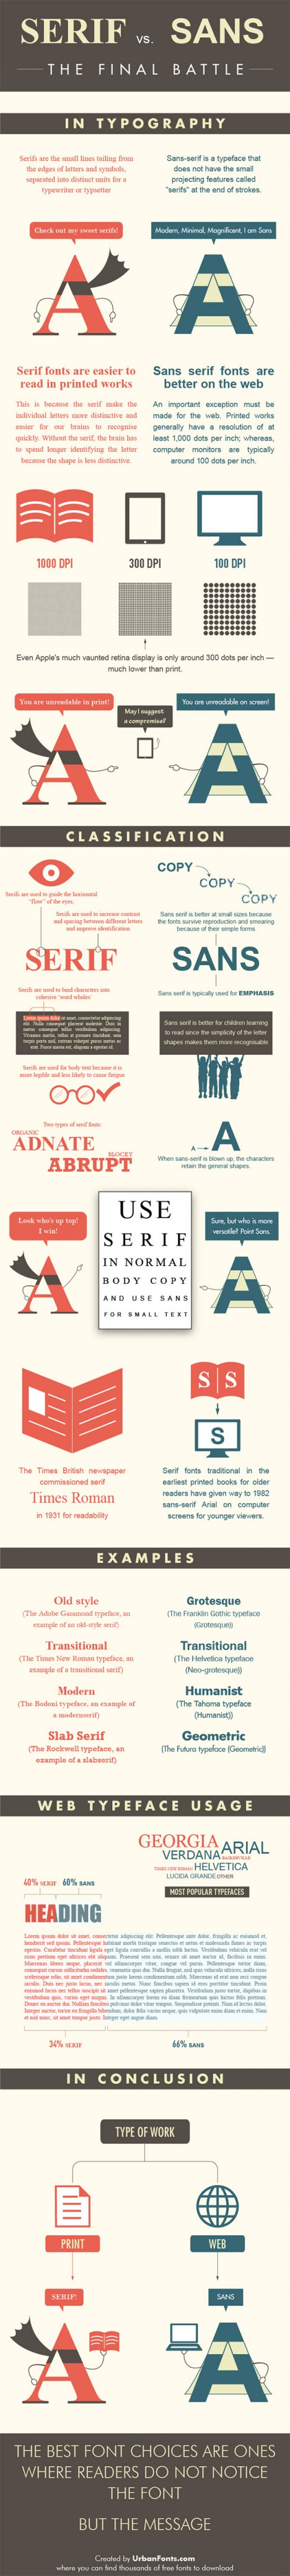 Serif vs Sans Fonts For Report